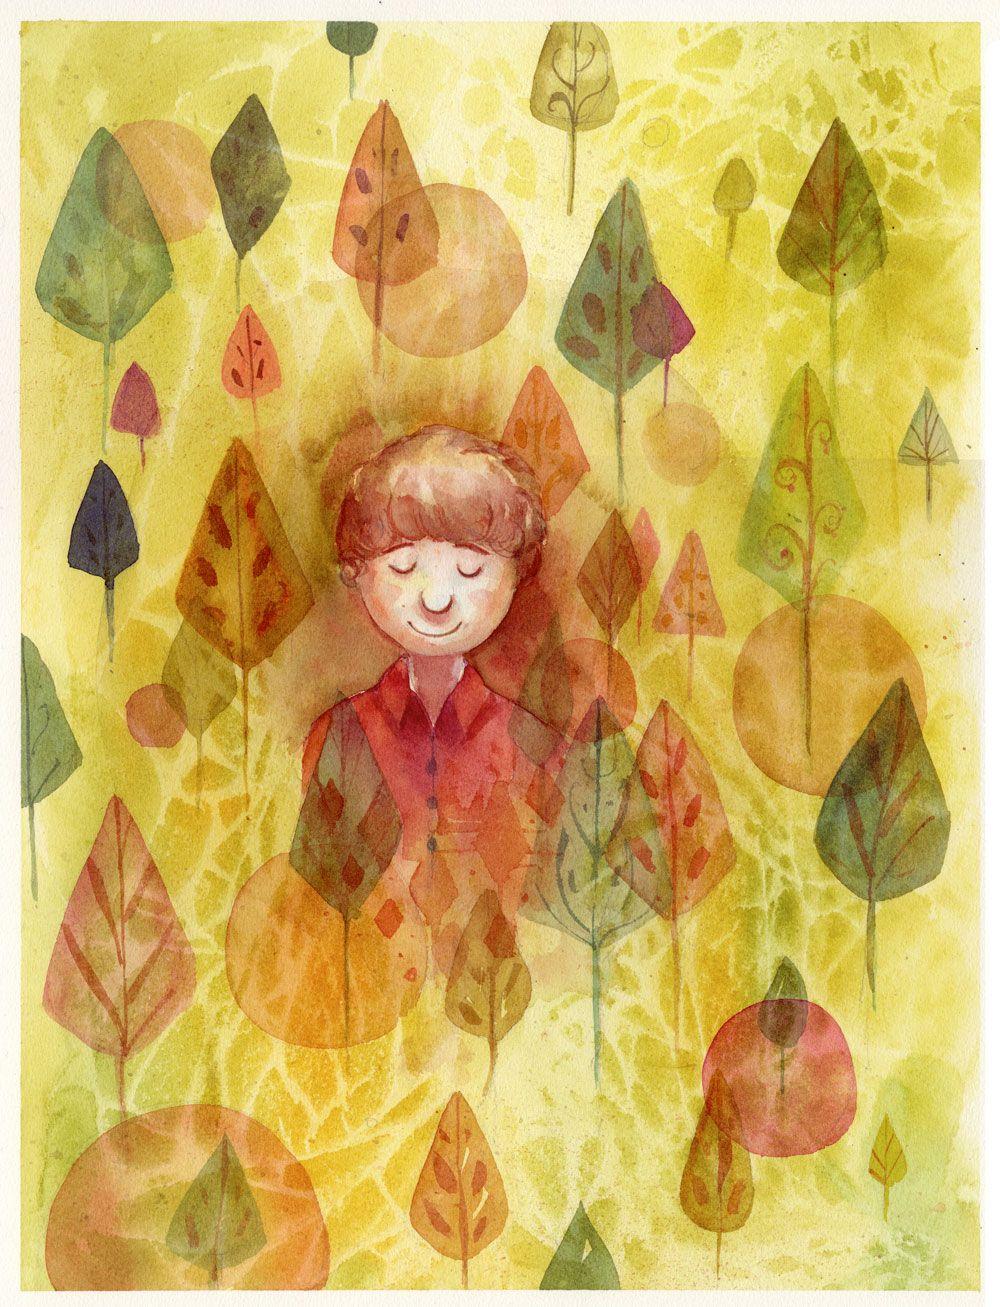 Armando Leiva Illustration - Galler